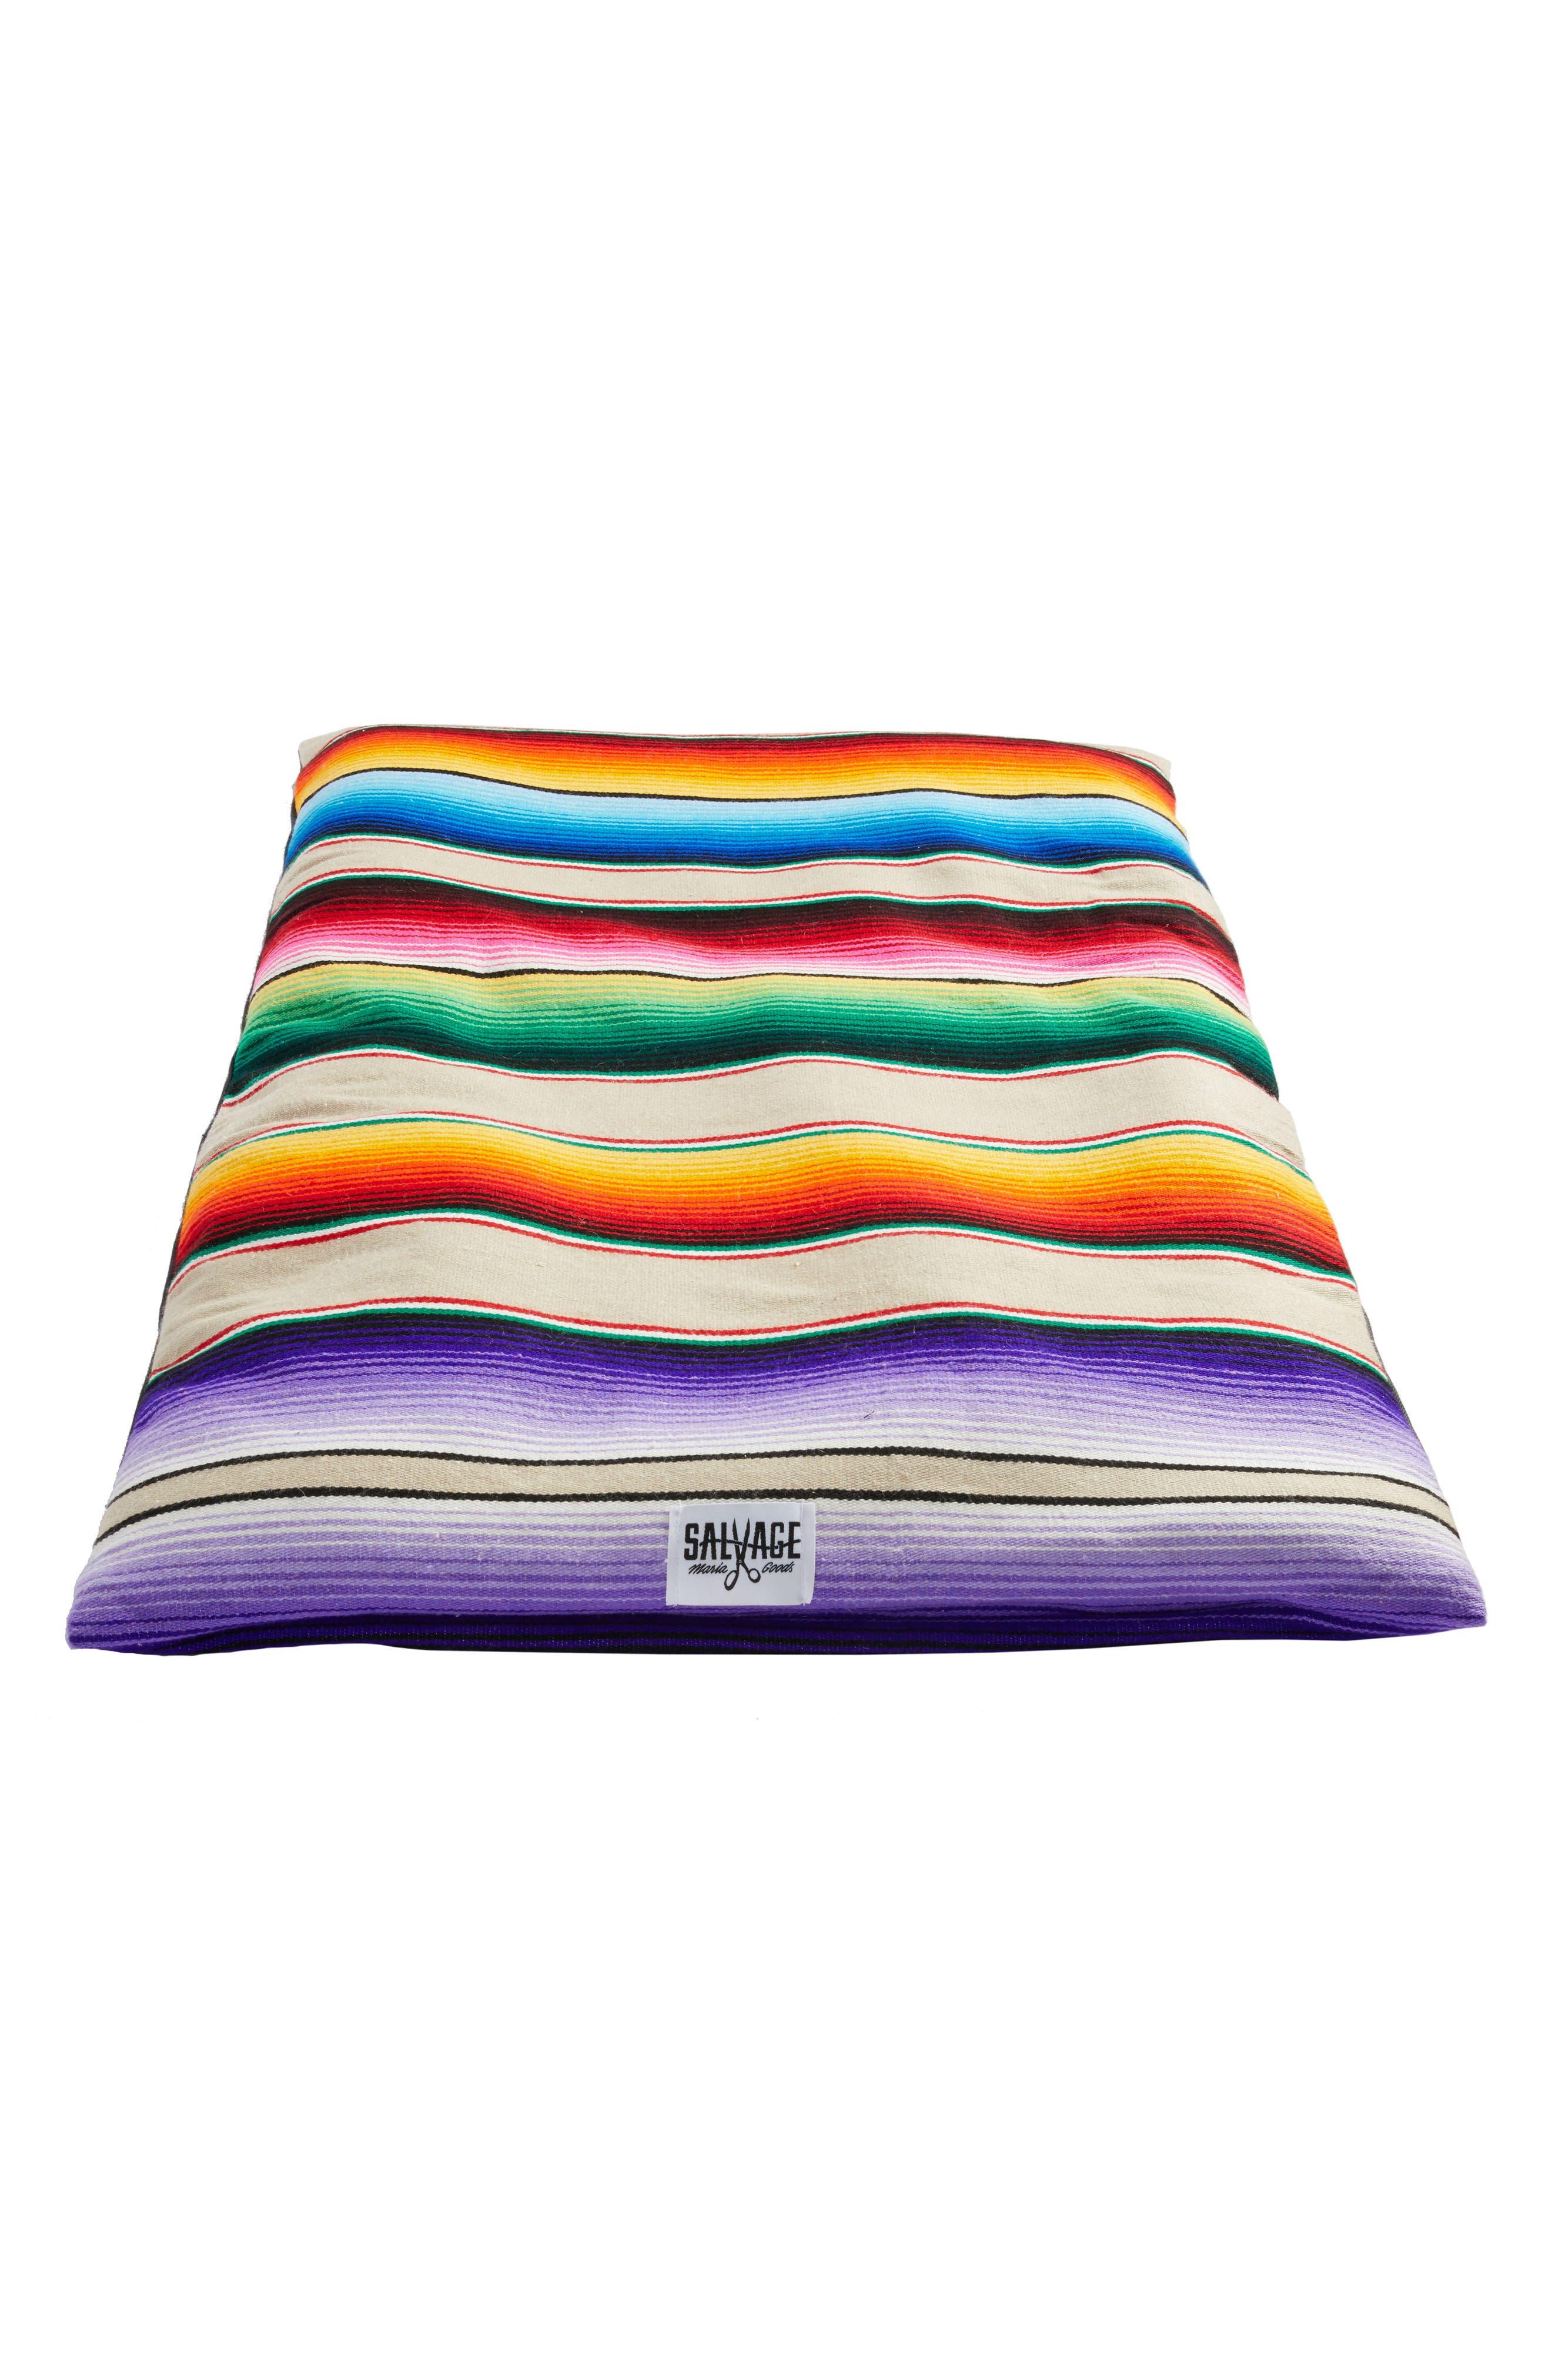 Salvage Maria Saltillo Serape Roll-Up Dog Bed